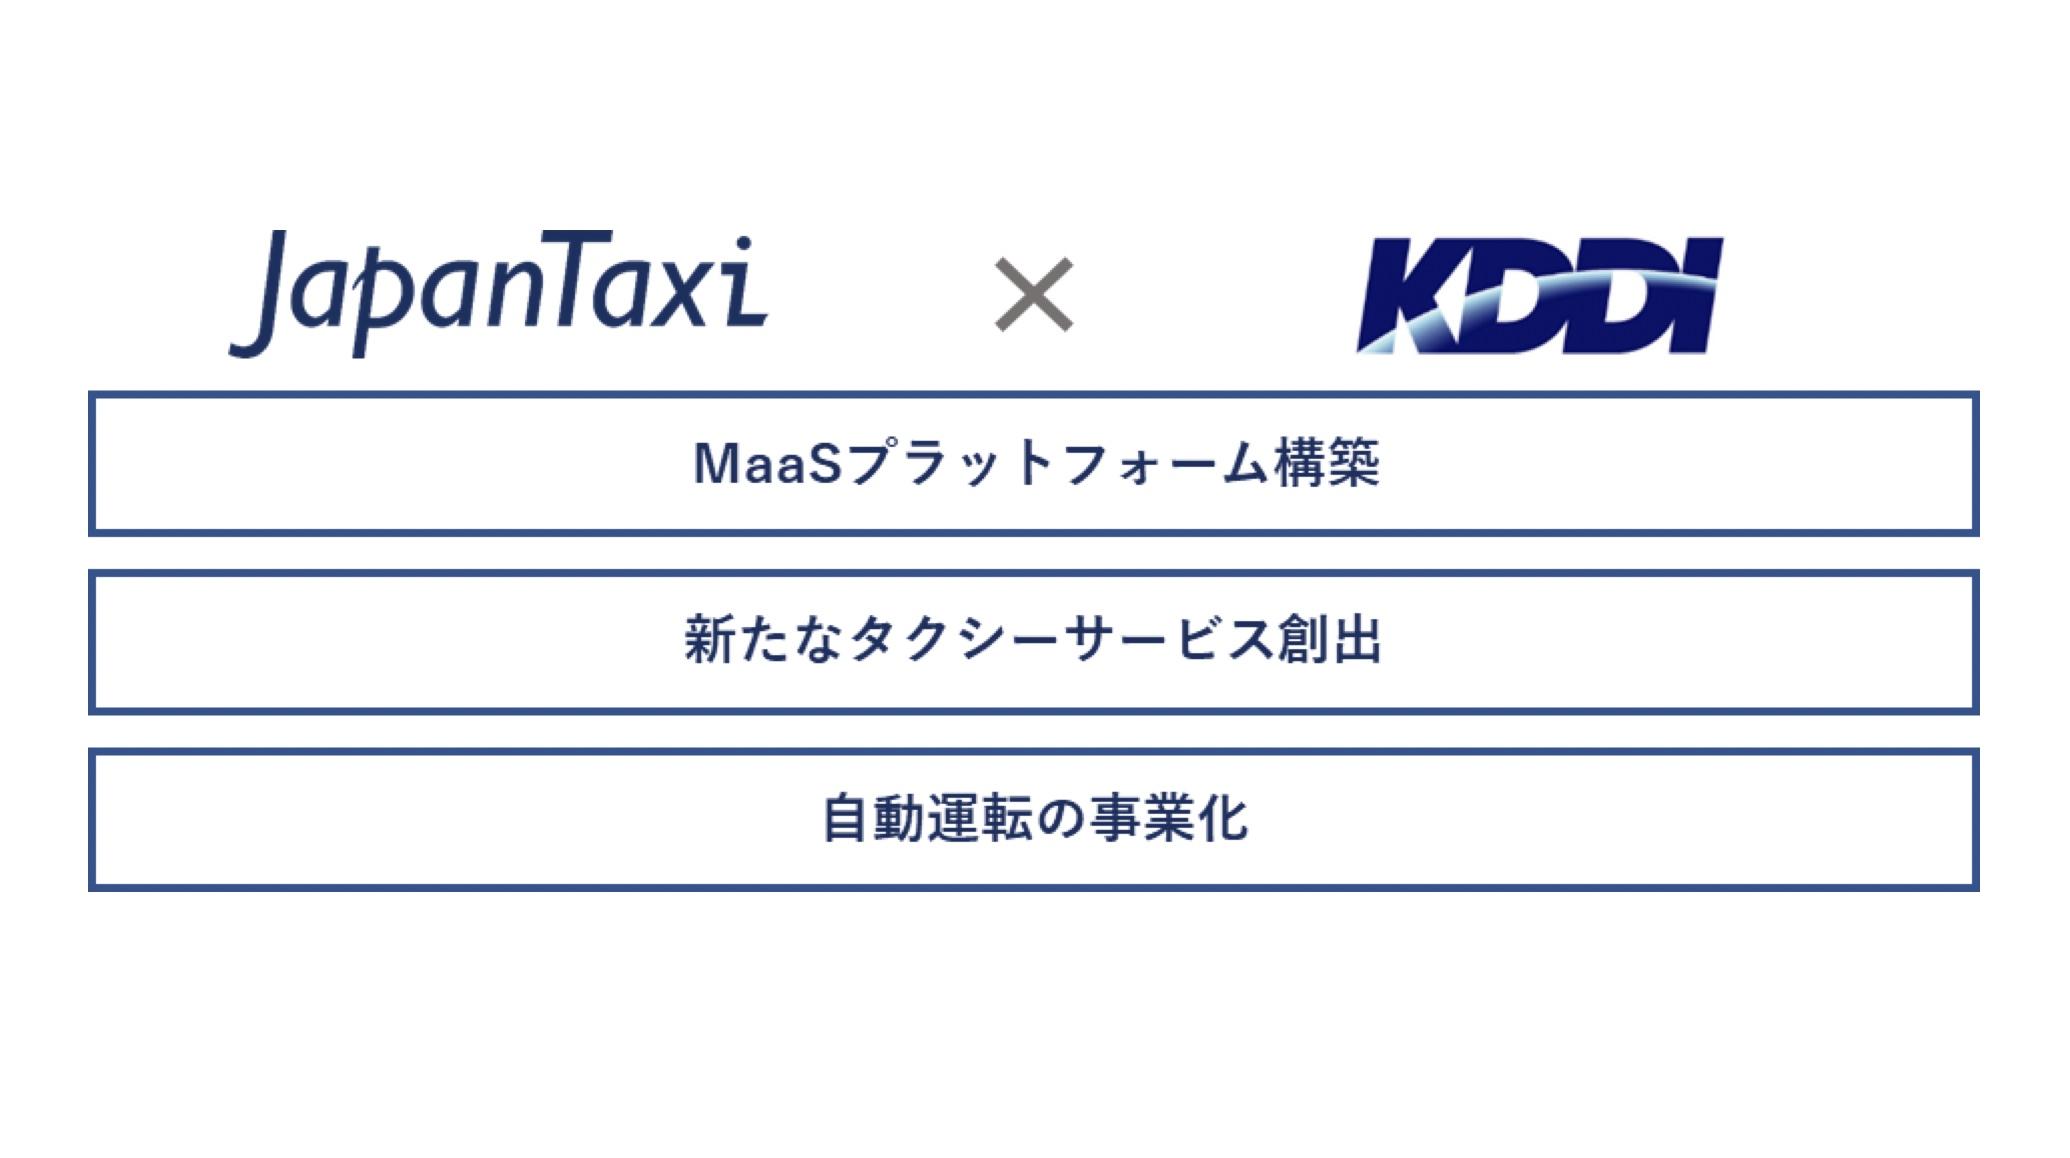 JapanTaxi×KDDI | MaaS時代の移動体験の高度化に向けて資本業務提携、タクシー事業者のDX支援を共同で推進